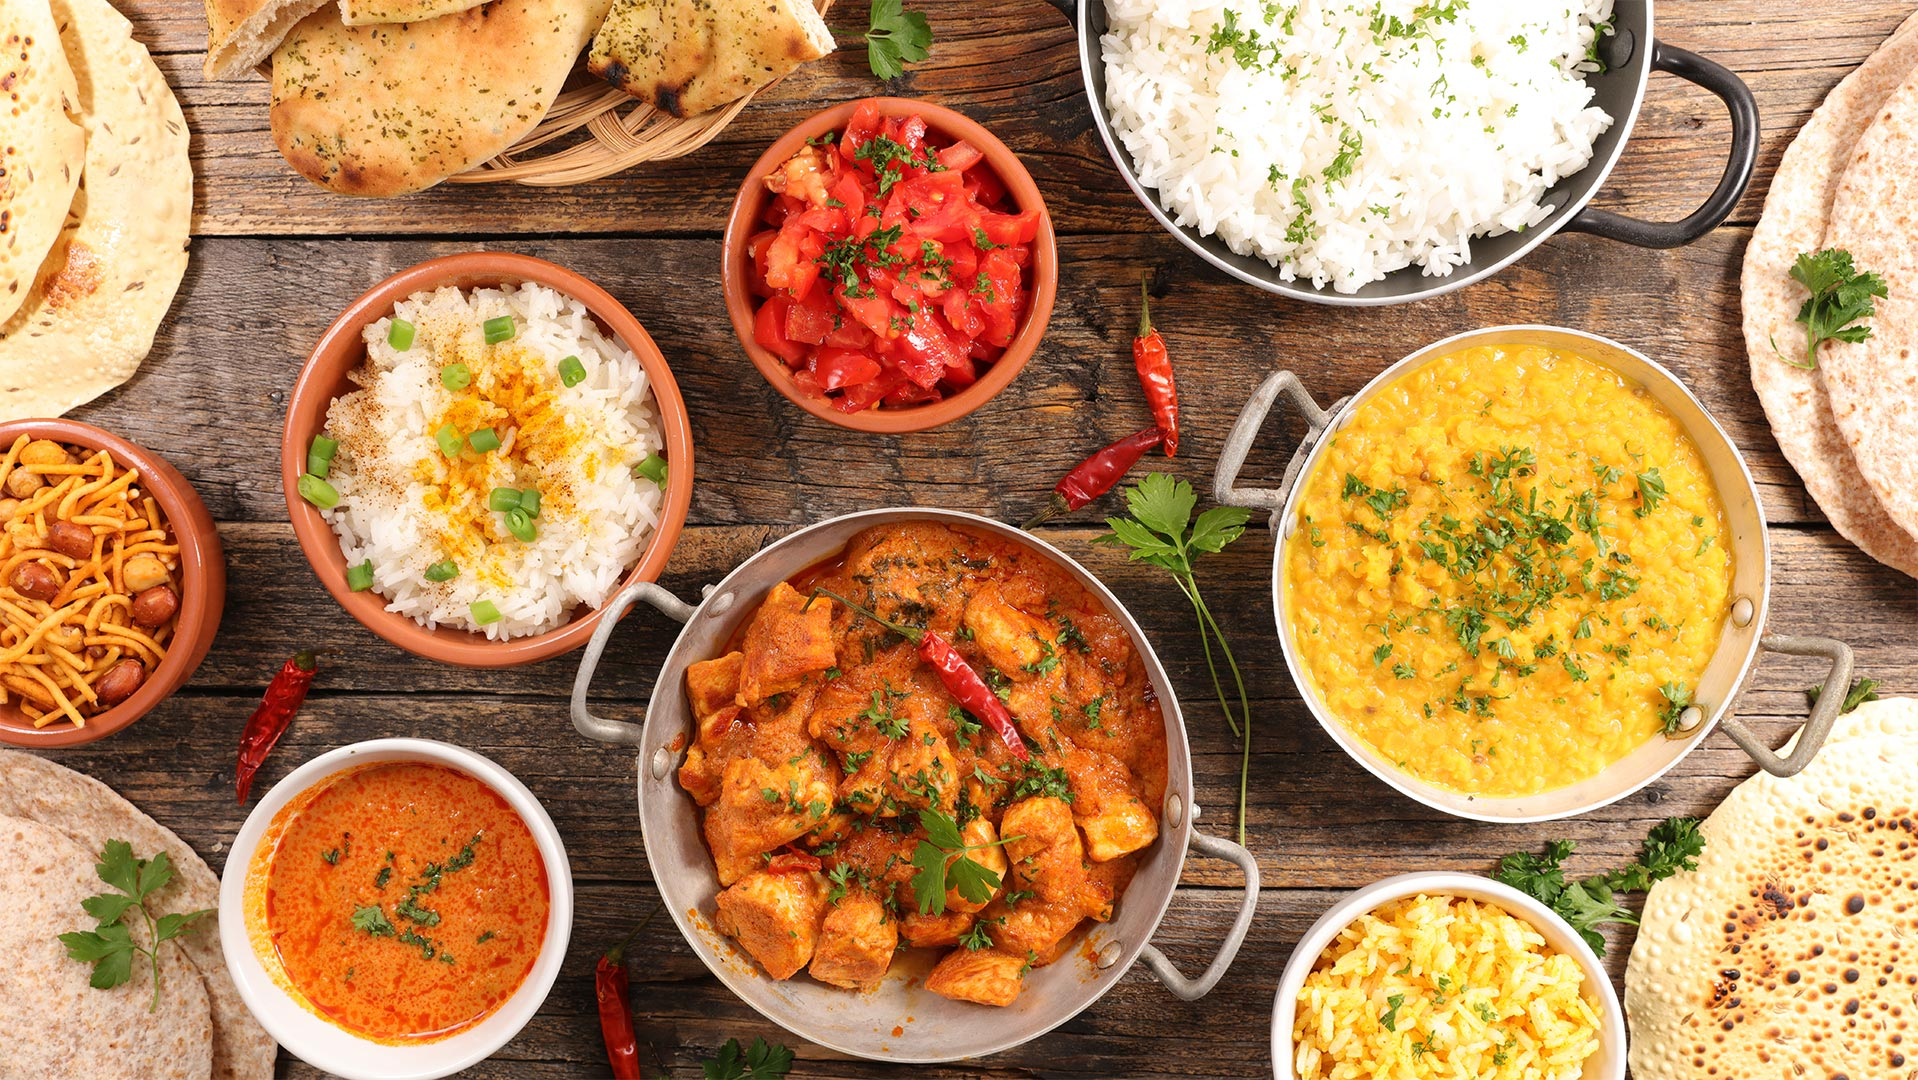 Bowls of indian food on wooden table, Tiki Masala, yellow rice, white rice, fresh chopped tomato and pita bread